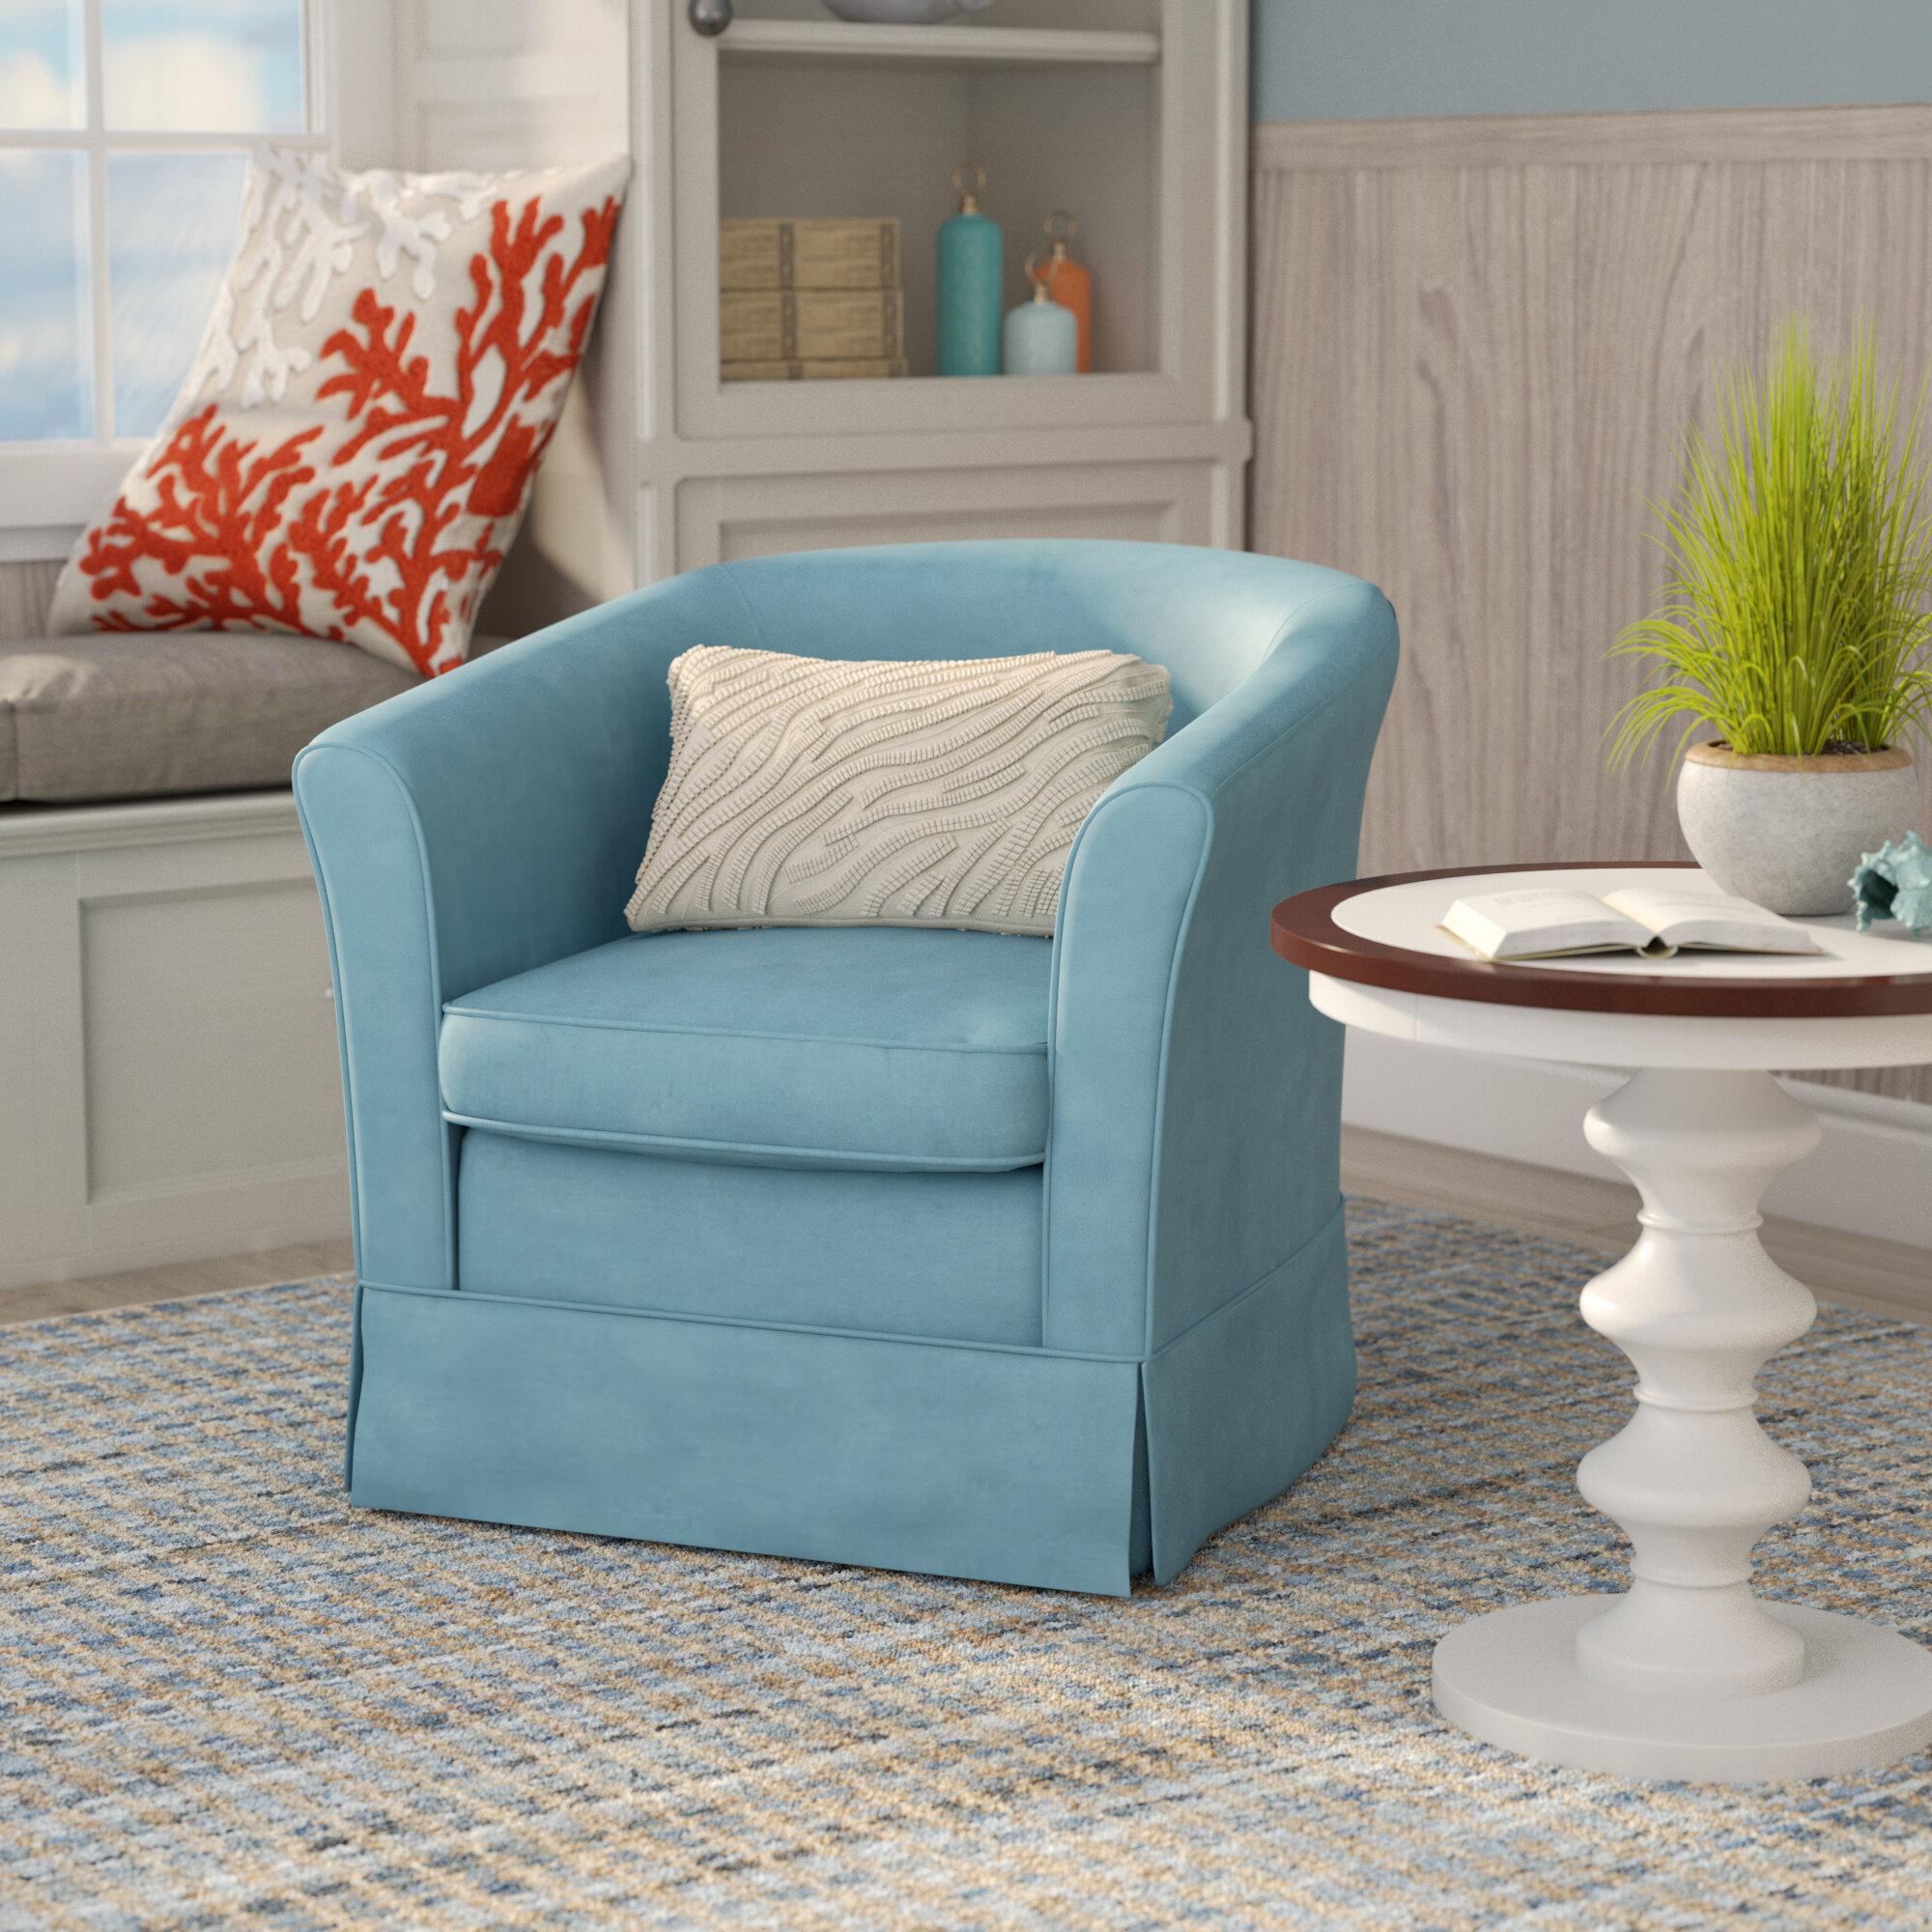 Laurel Foundry Modern Farmhouse Sevan Swivel Barrel Chair U0026 Reviews |  Wayfair